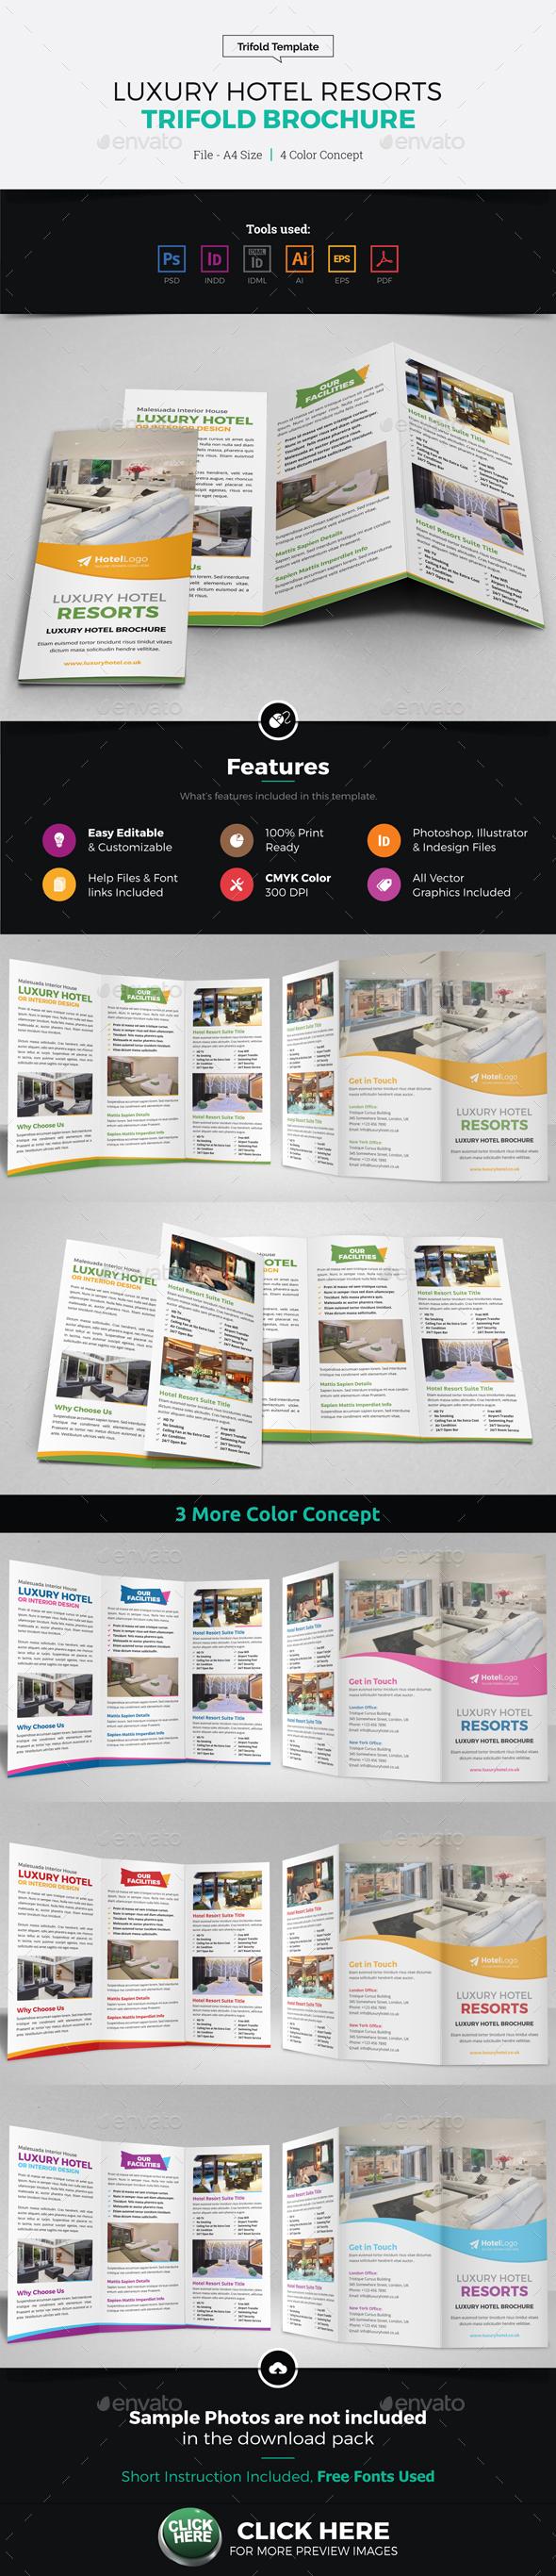 Luxury Hotel Resort Trifold Brochure - Corporate Brochures